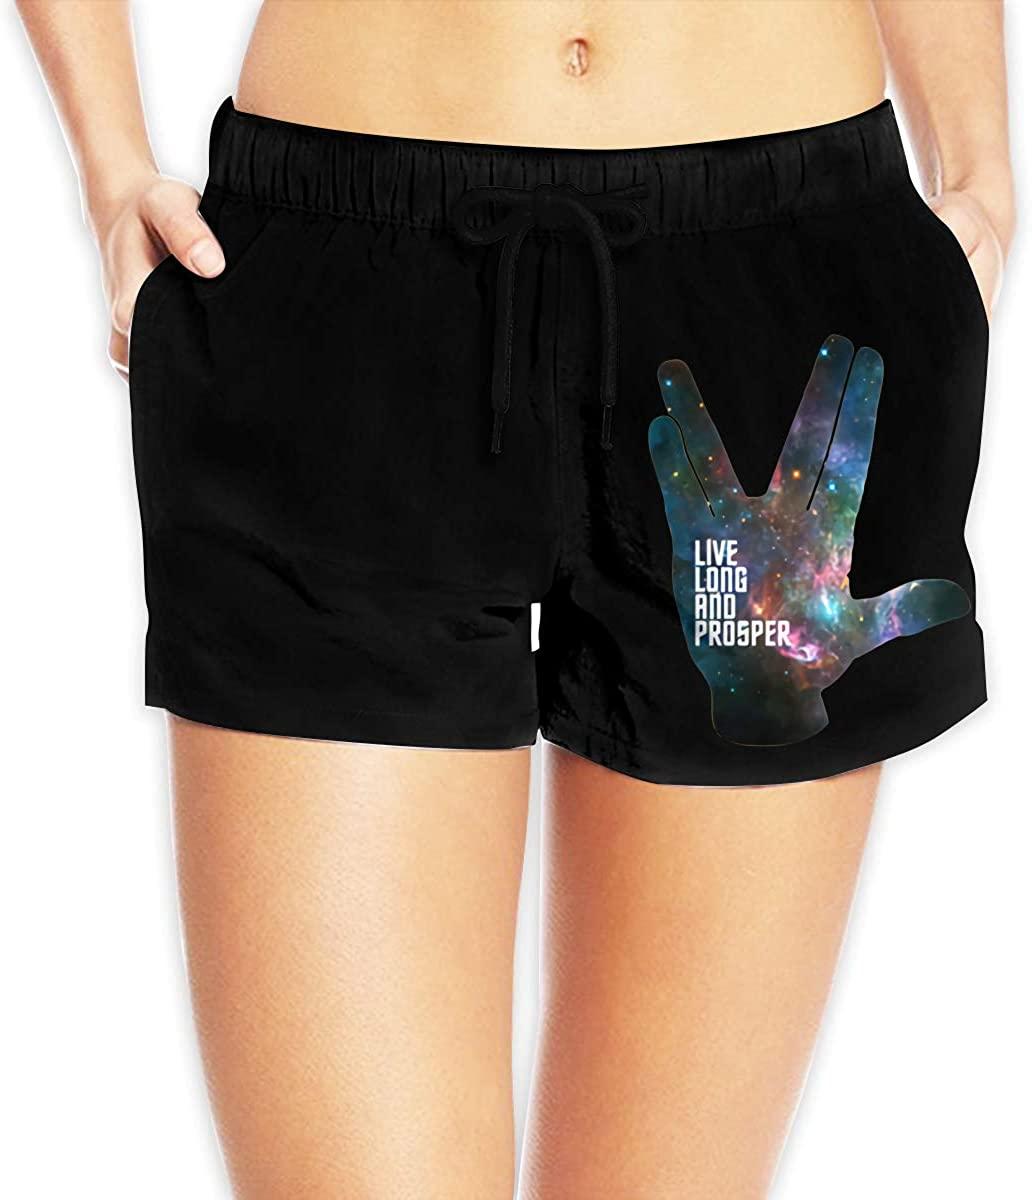 N/C Live Long and Prosper Women's Beach Shorts Quick-Drying Swimwear Summer Sports Pants